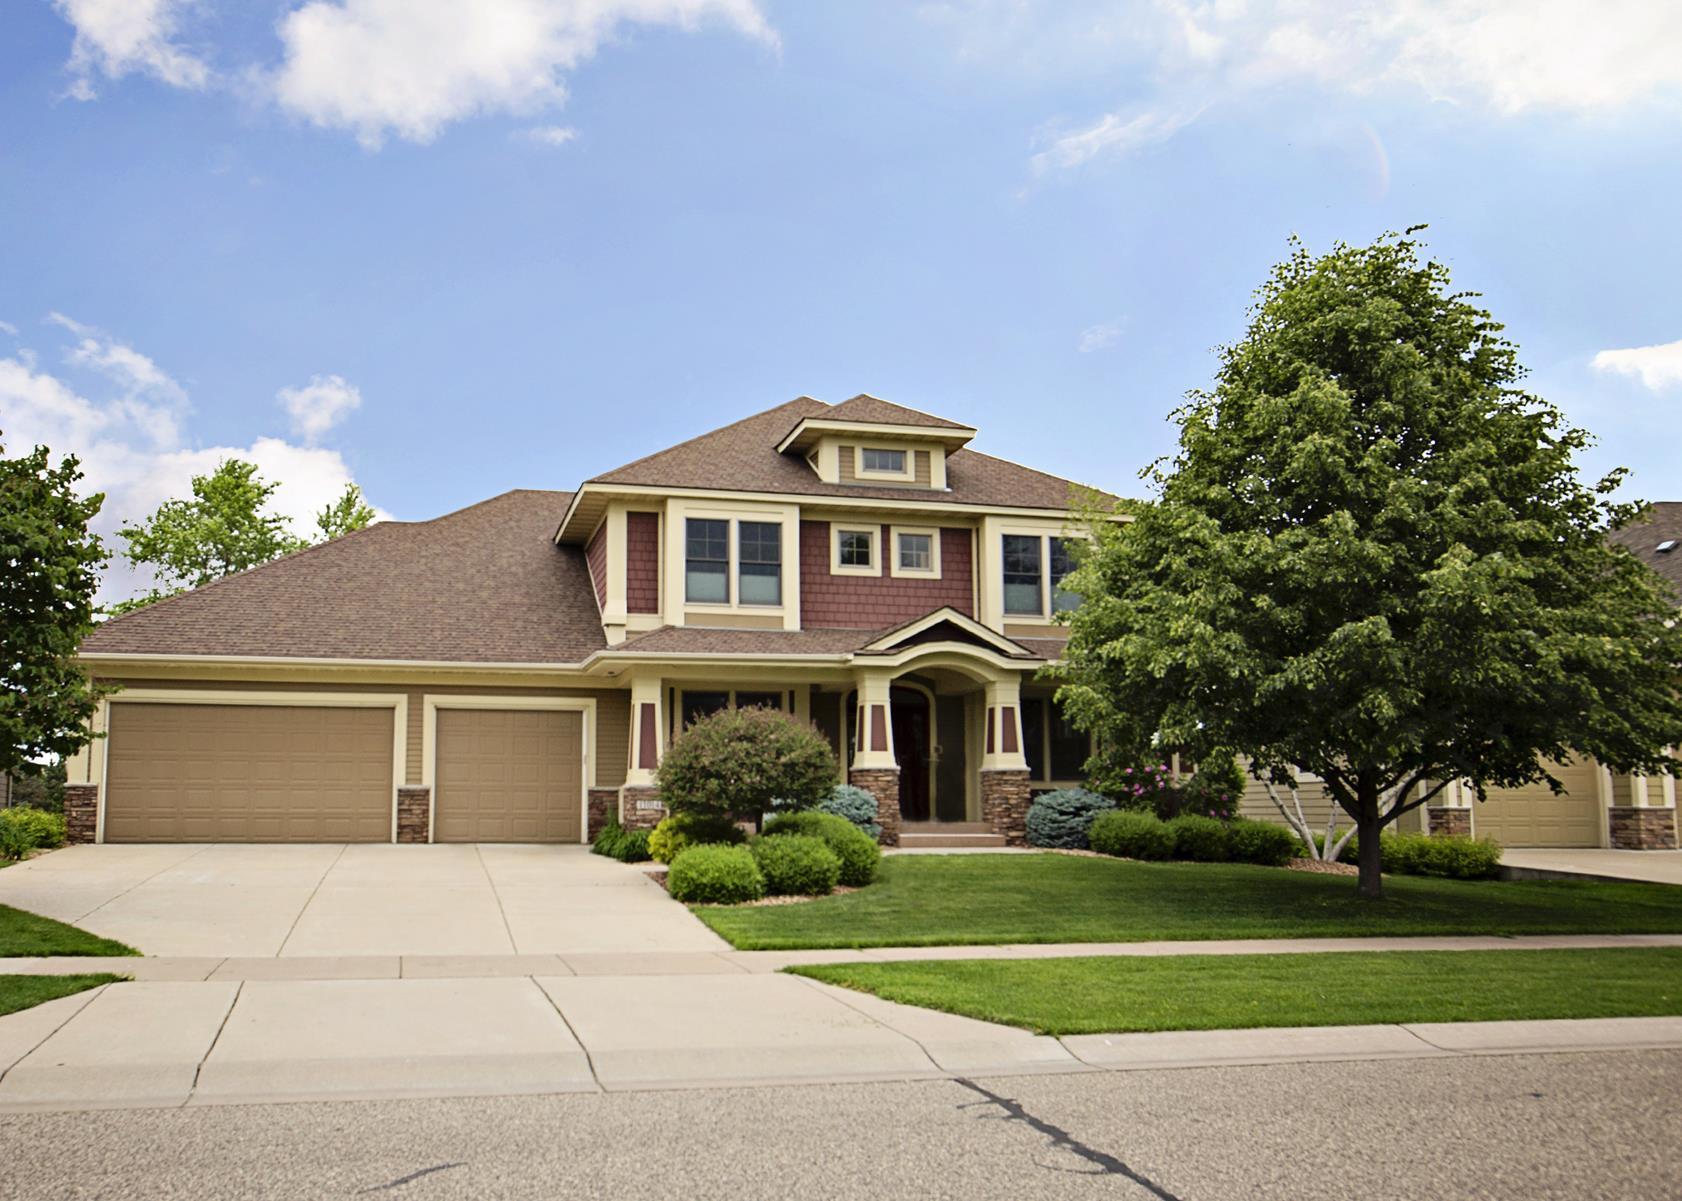 Moradia para Venda às 11014 Sweetwater Path Woodbury, Minnesota, 55129 Estados Unidos